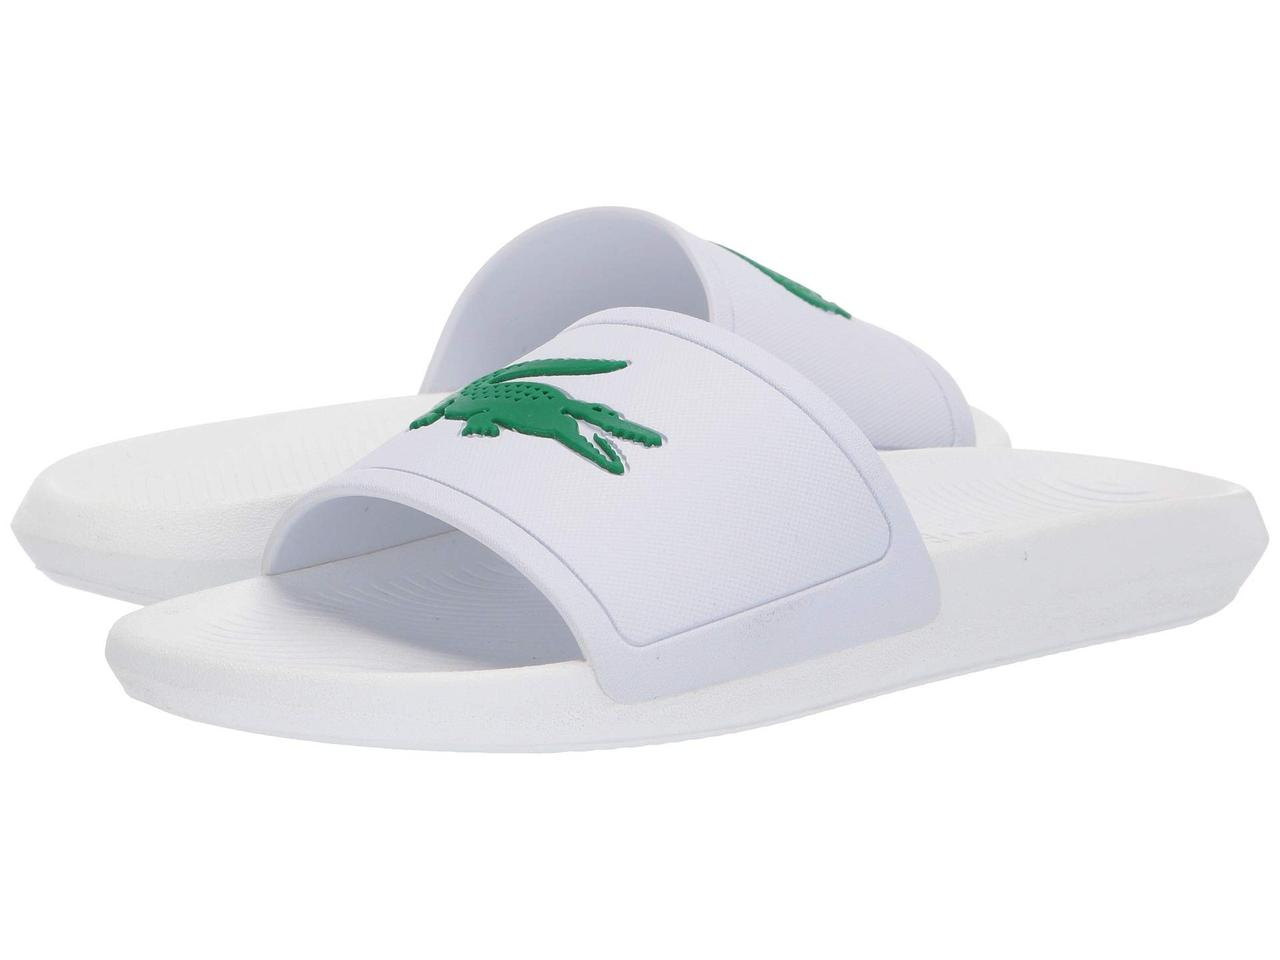 Сандали/Вьетнамки (Оригинал) Lacoste Croco Slide 119 1 White/Green